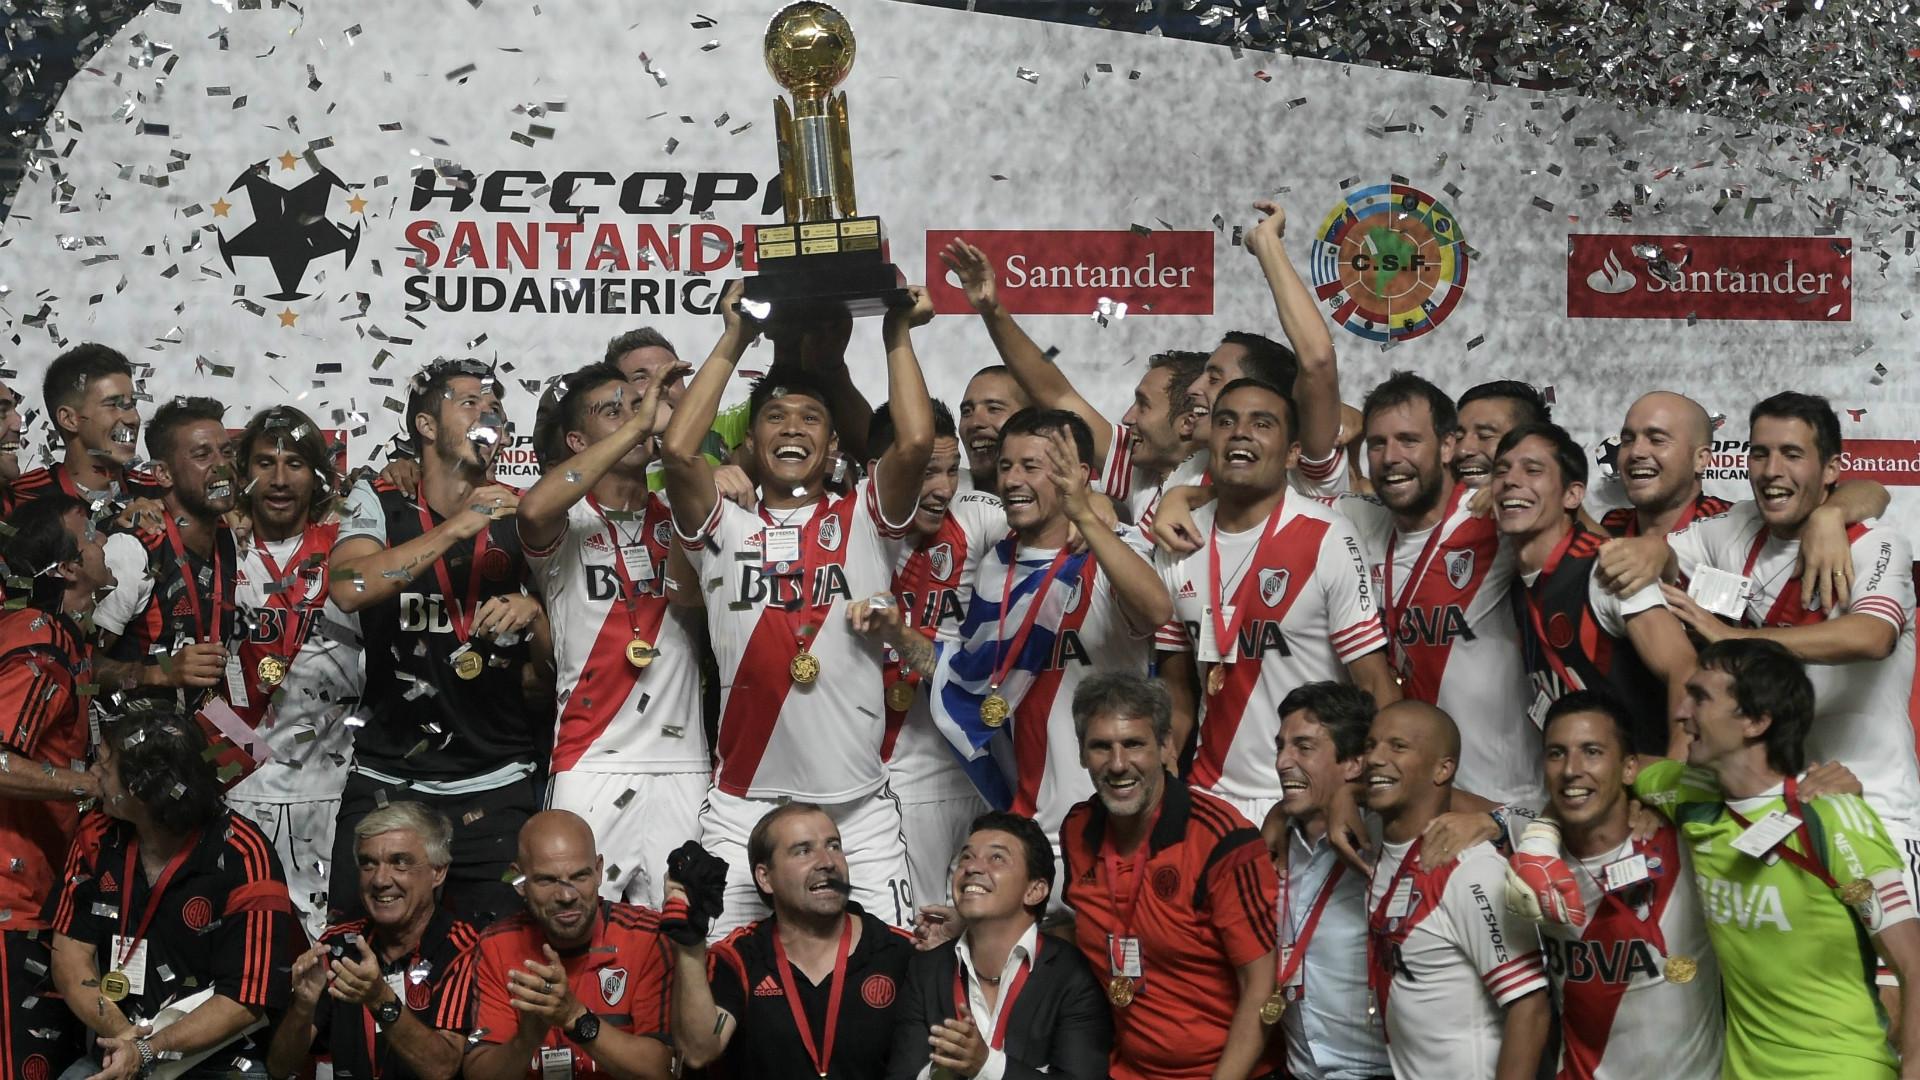 River Plate Recopa Sudamericana 2015